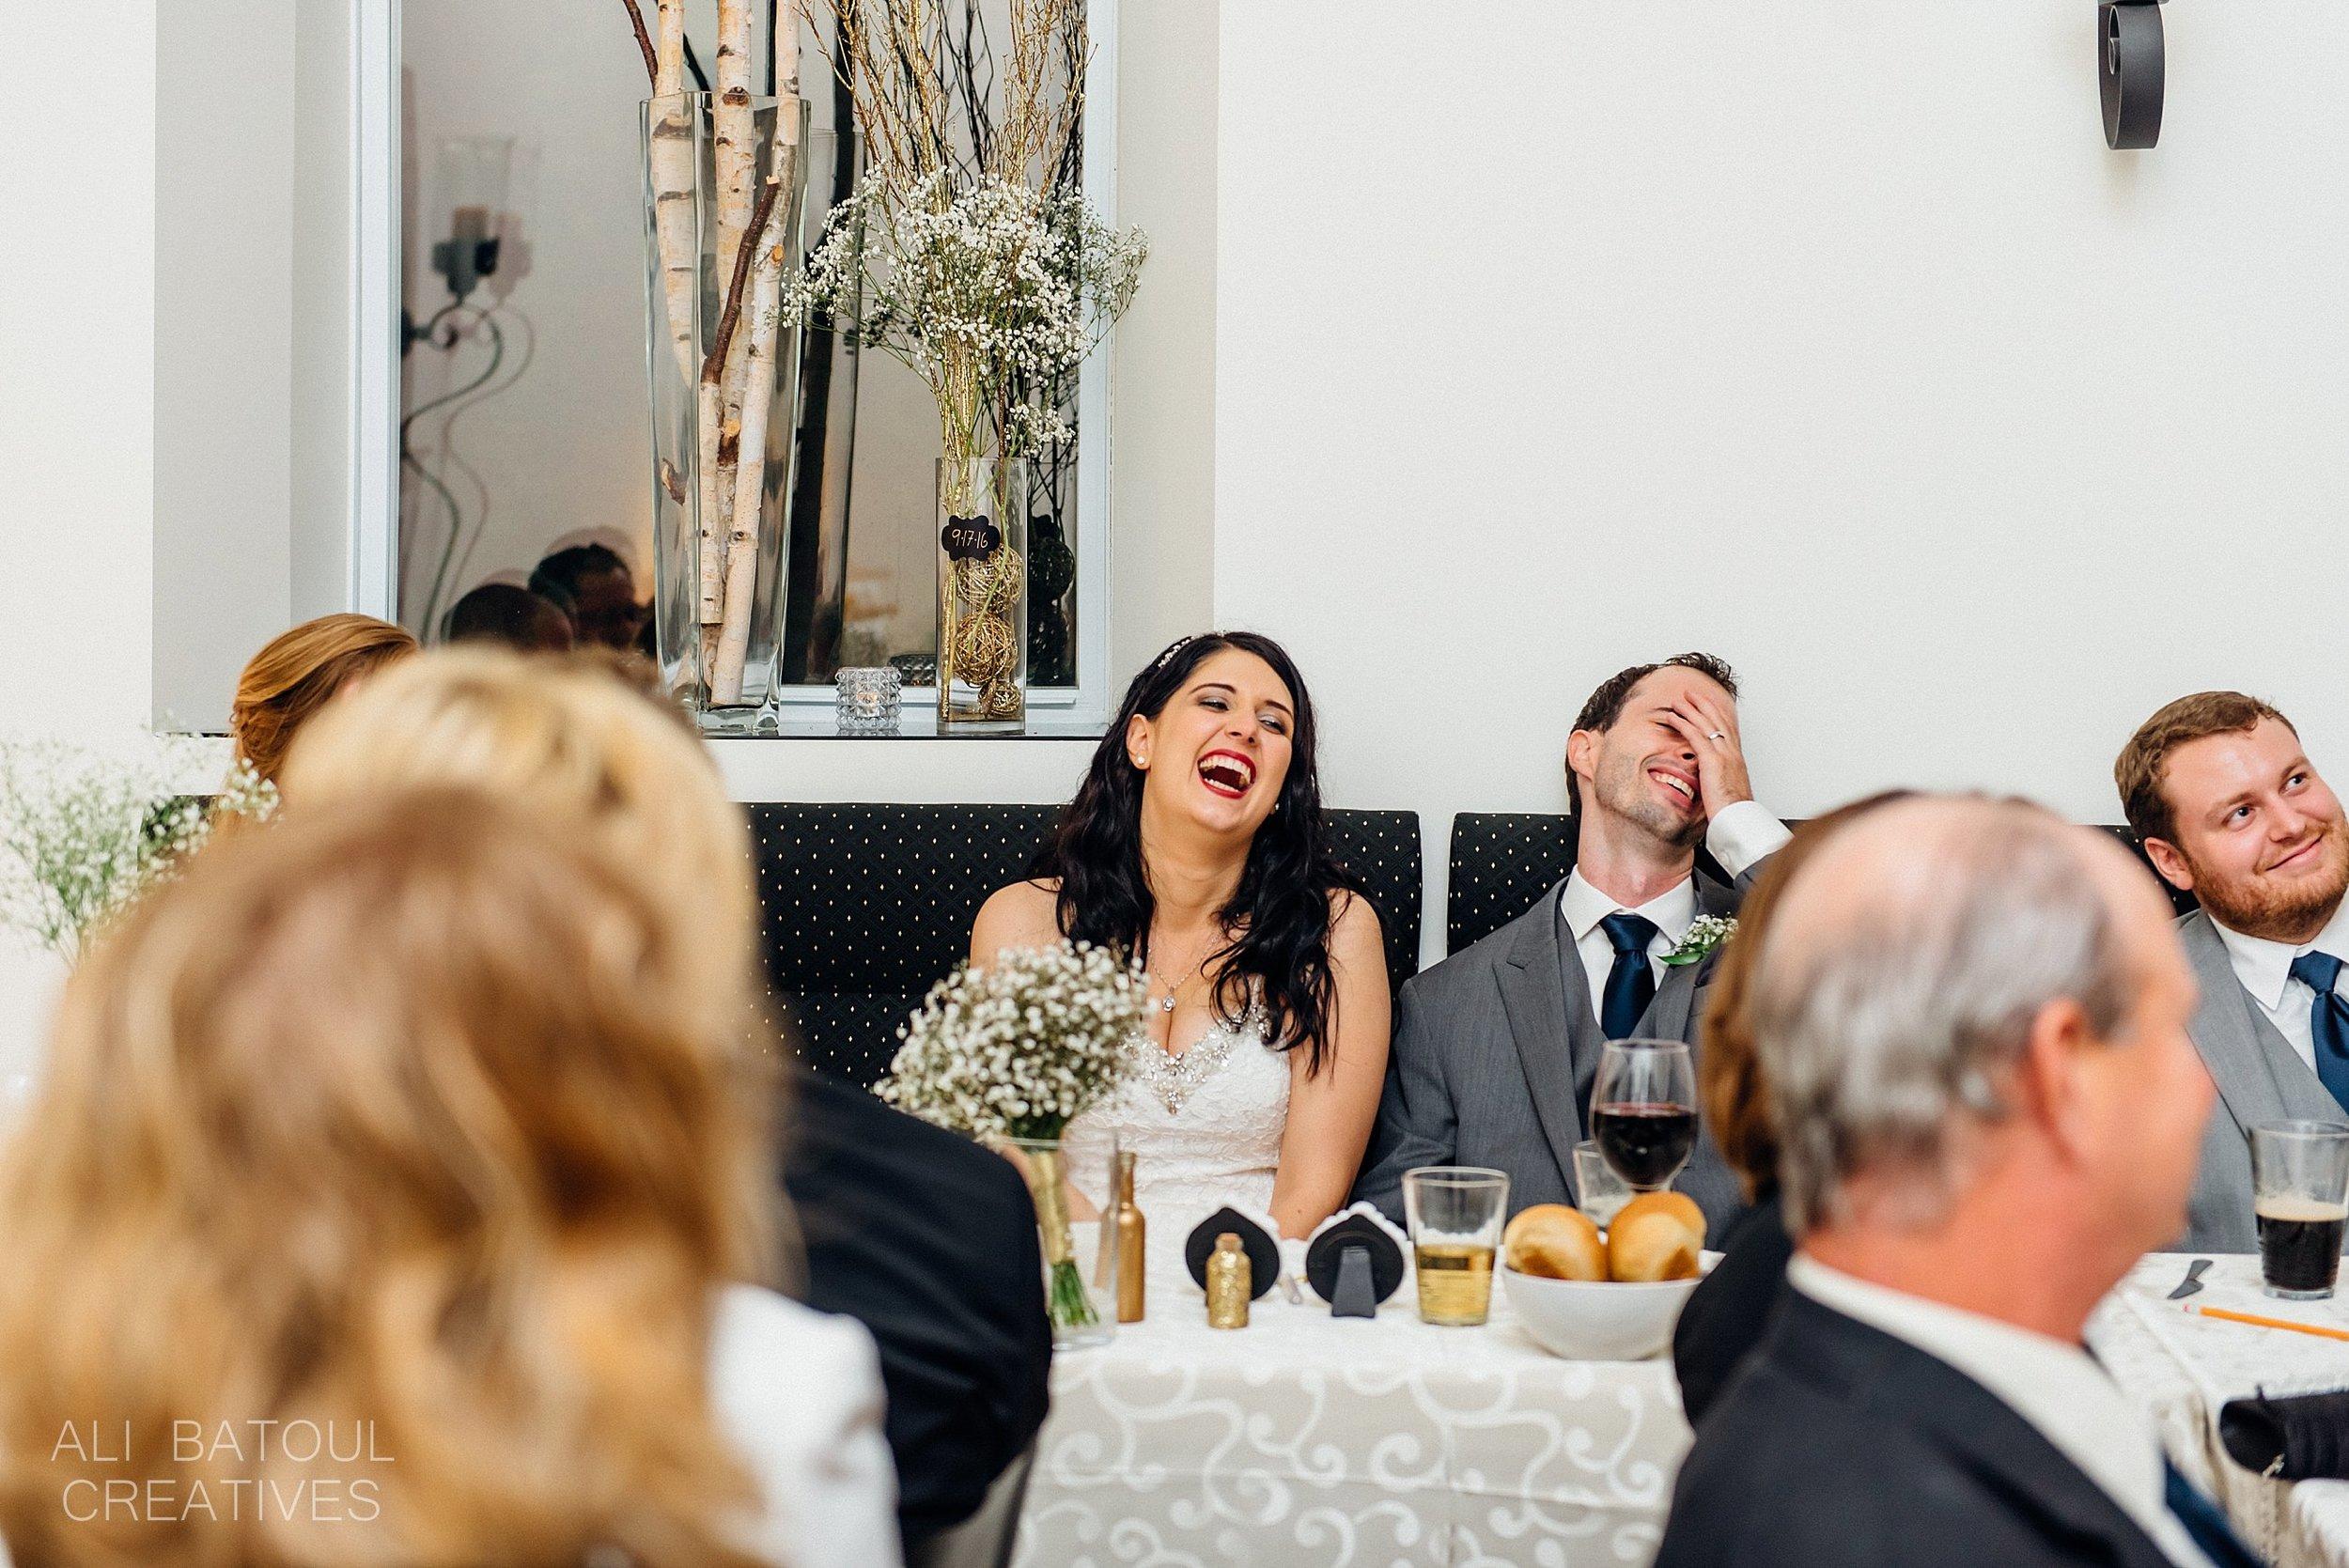 Jocelyn + Steve At The Schoolhouse Wedding - Ali and Batoul Fine Art Wedding Photography_0086.jpg